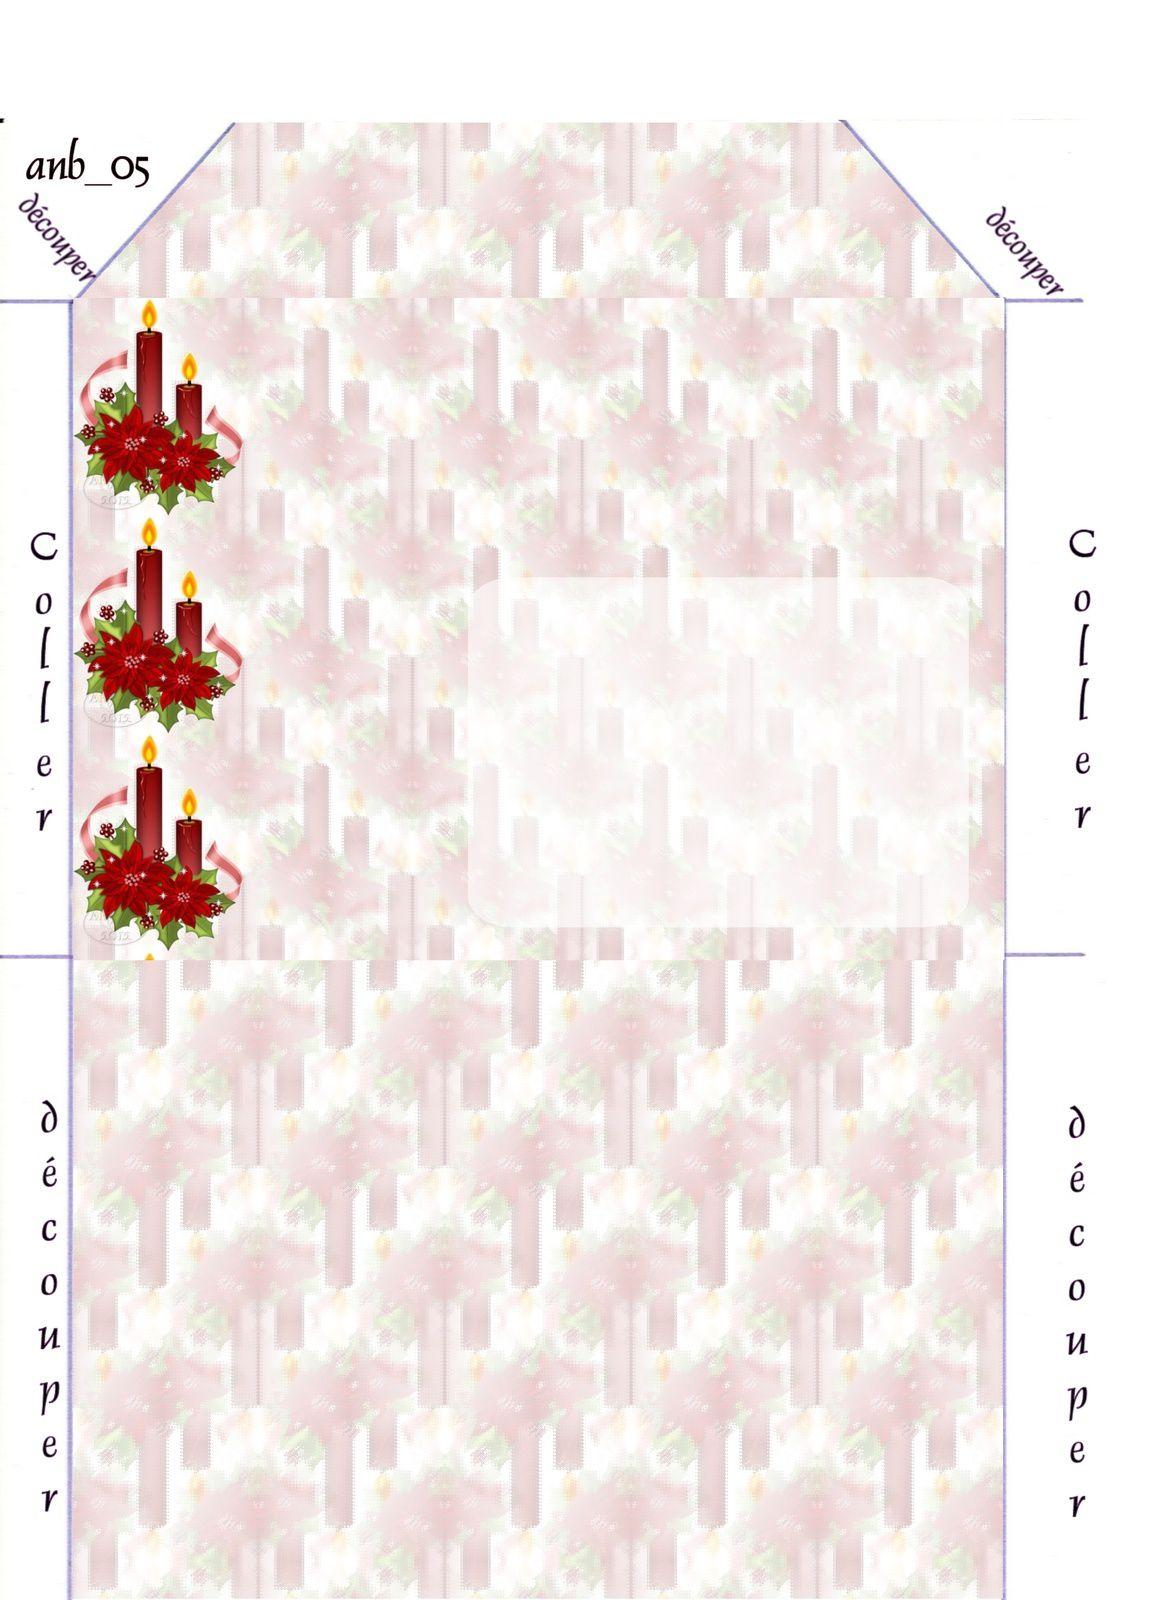 Thème Bougies animées perso Incredimail &amp&#x3B; Papier A4 h l &amp&#x3B; outlook gif &amp&#x3B; enveloppe &amp&#x3B; 2 cartes A5 &amp&#x3B; signets 3 langues plus Noël multilangues  bougies_animes_perso_20121205_190130_00_johanne_incredimail